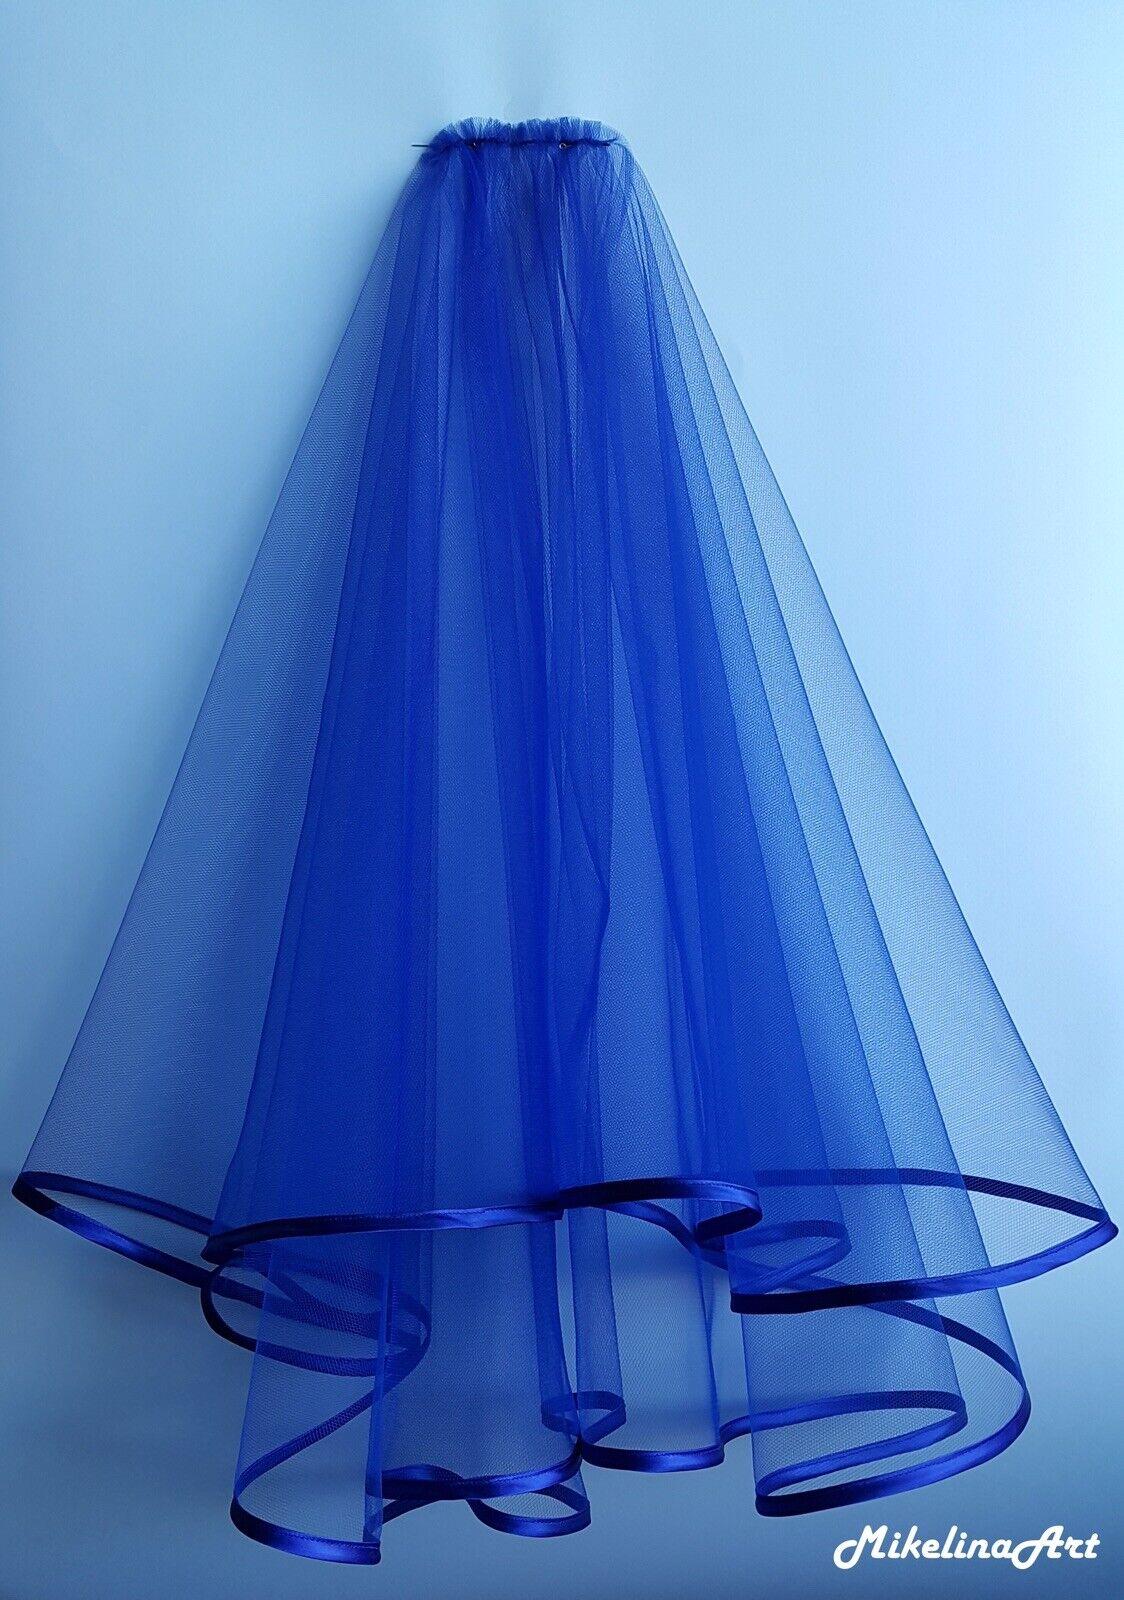 Wedding Veil Royal Blue,Two Layers,Royal Satin Edging,Handmade Item,tulle